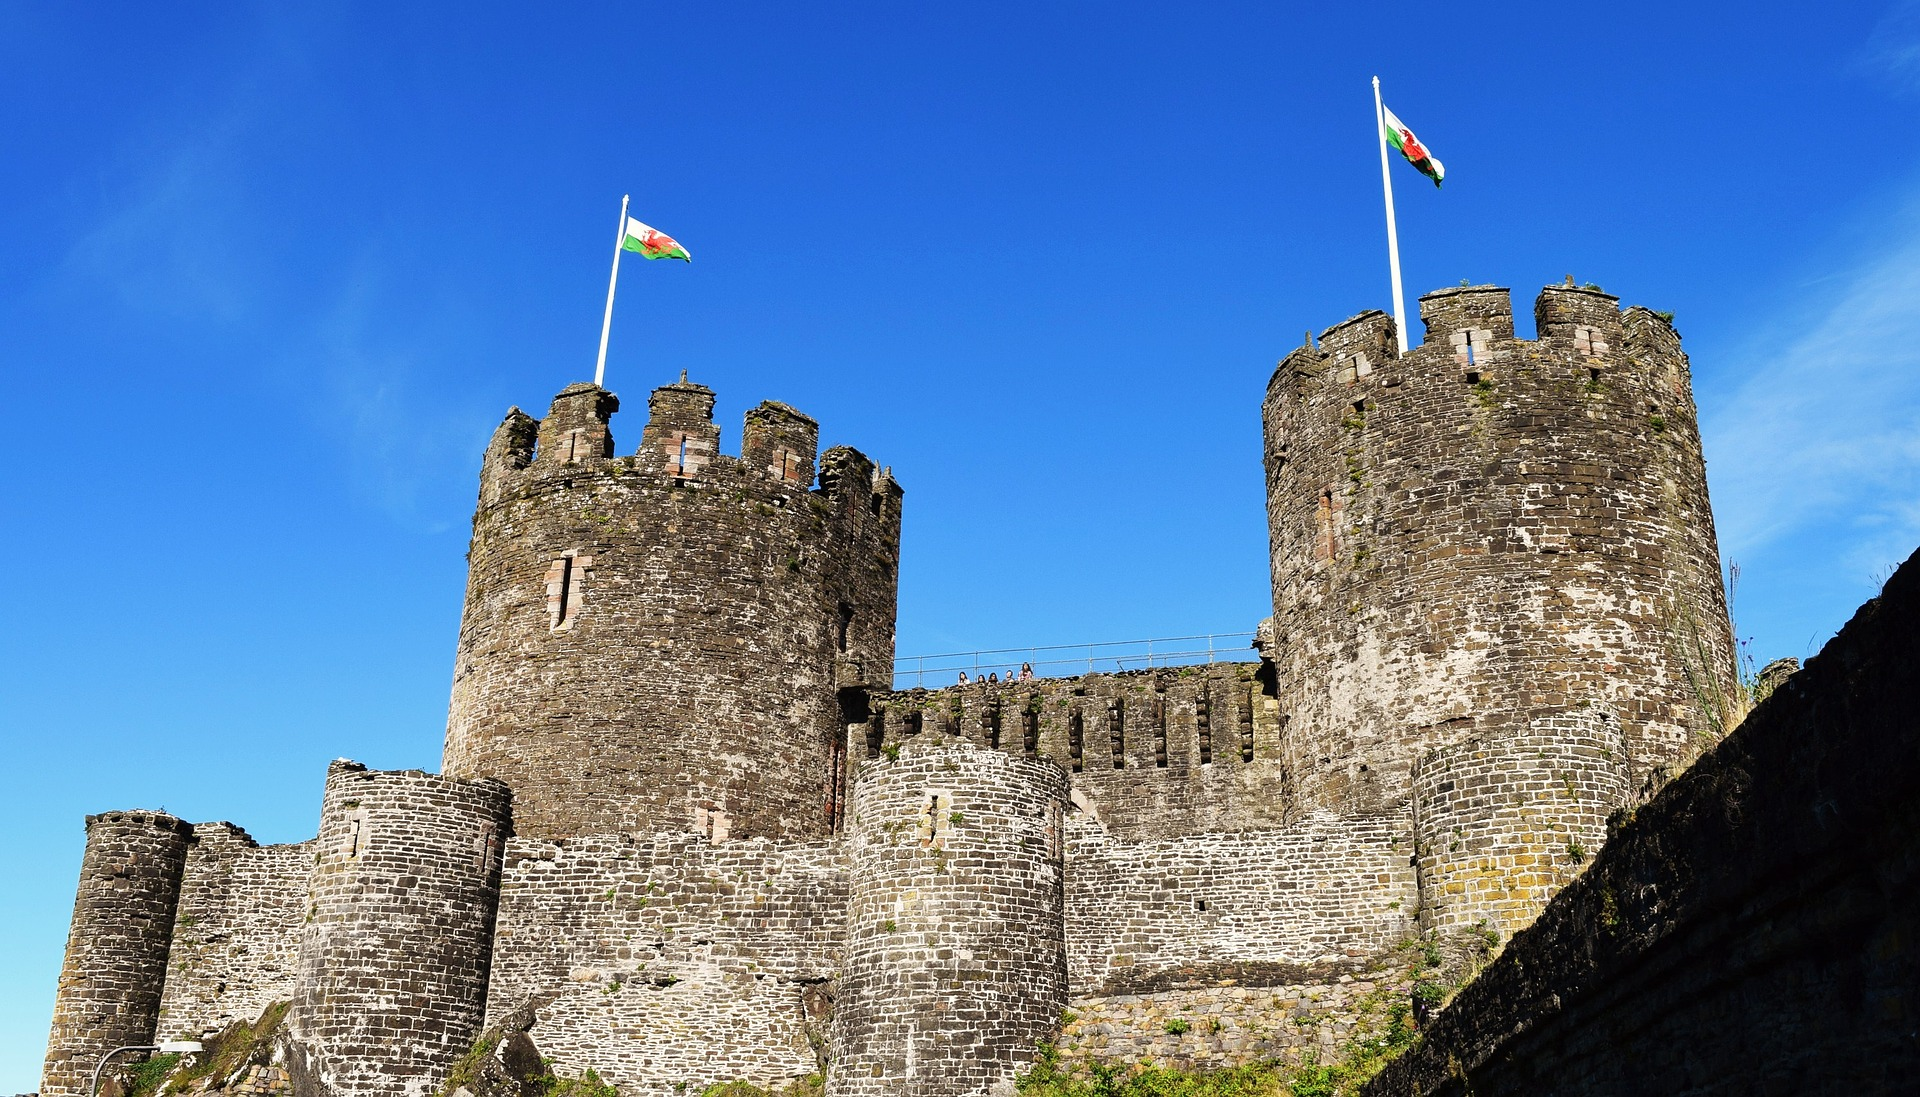 castle-1863724_1920.jpg